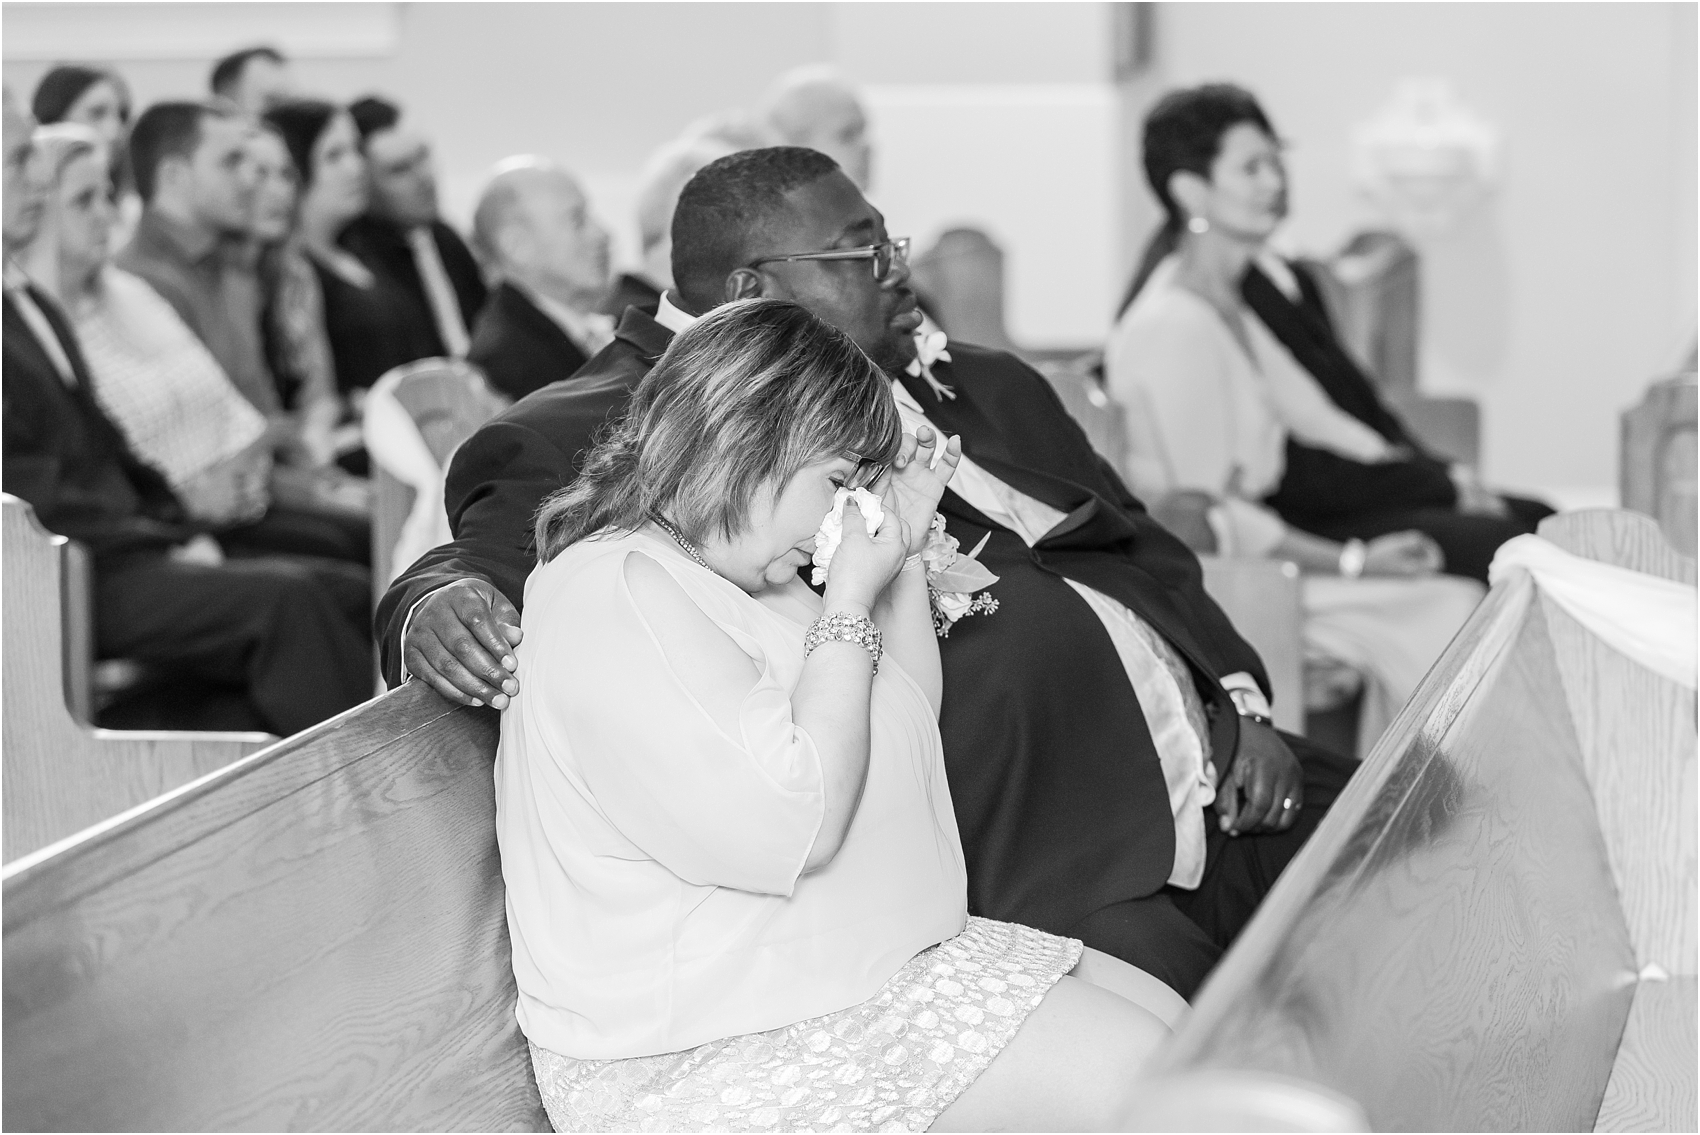 elegant-and-romantic-fall-wedding-photos-at-st-marys-catholic-church-in-monroe-michigan-by-courtney-carolyn-photography_0019.jpg